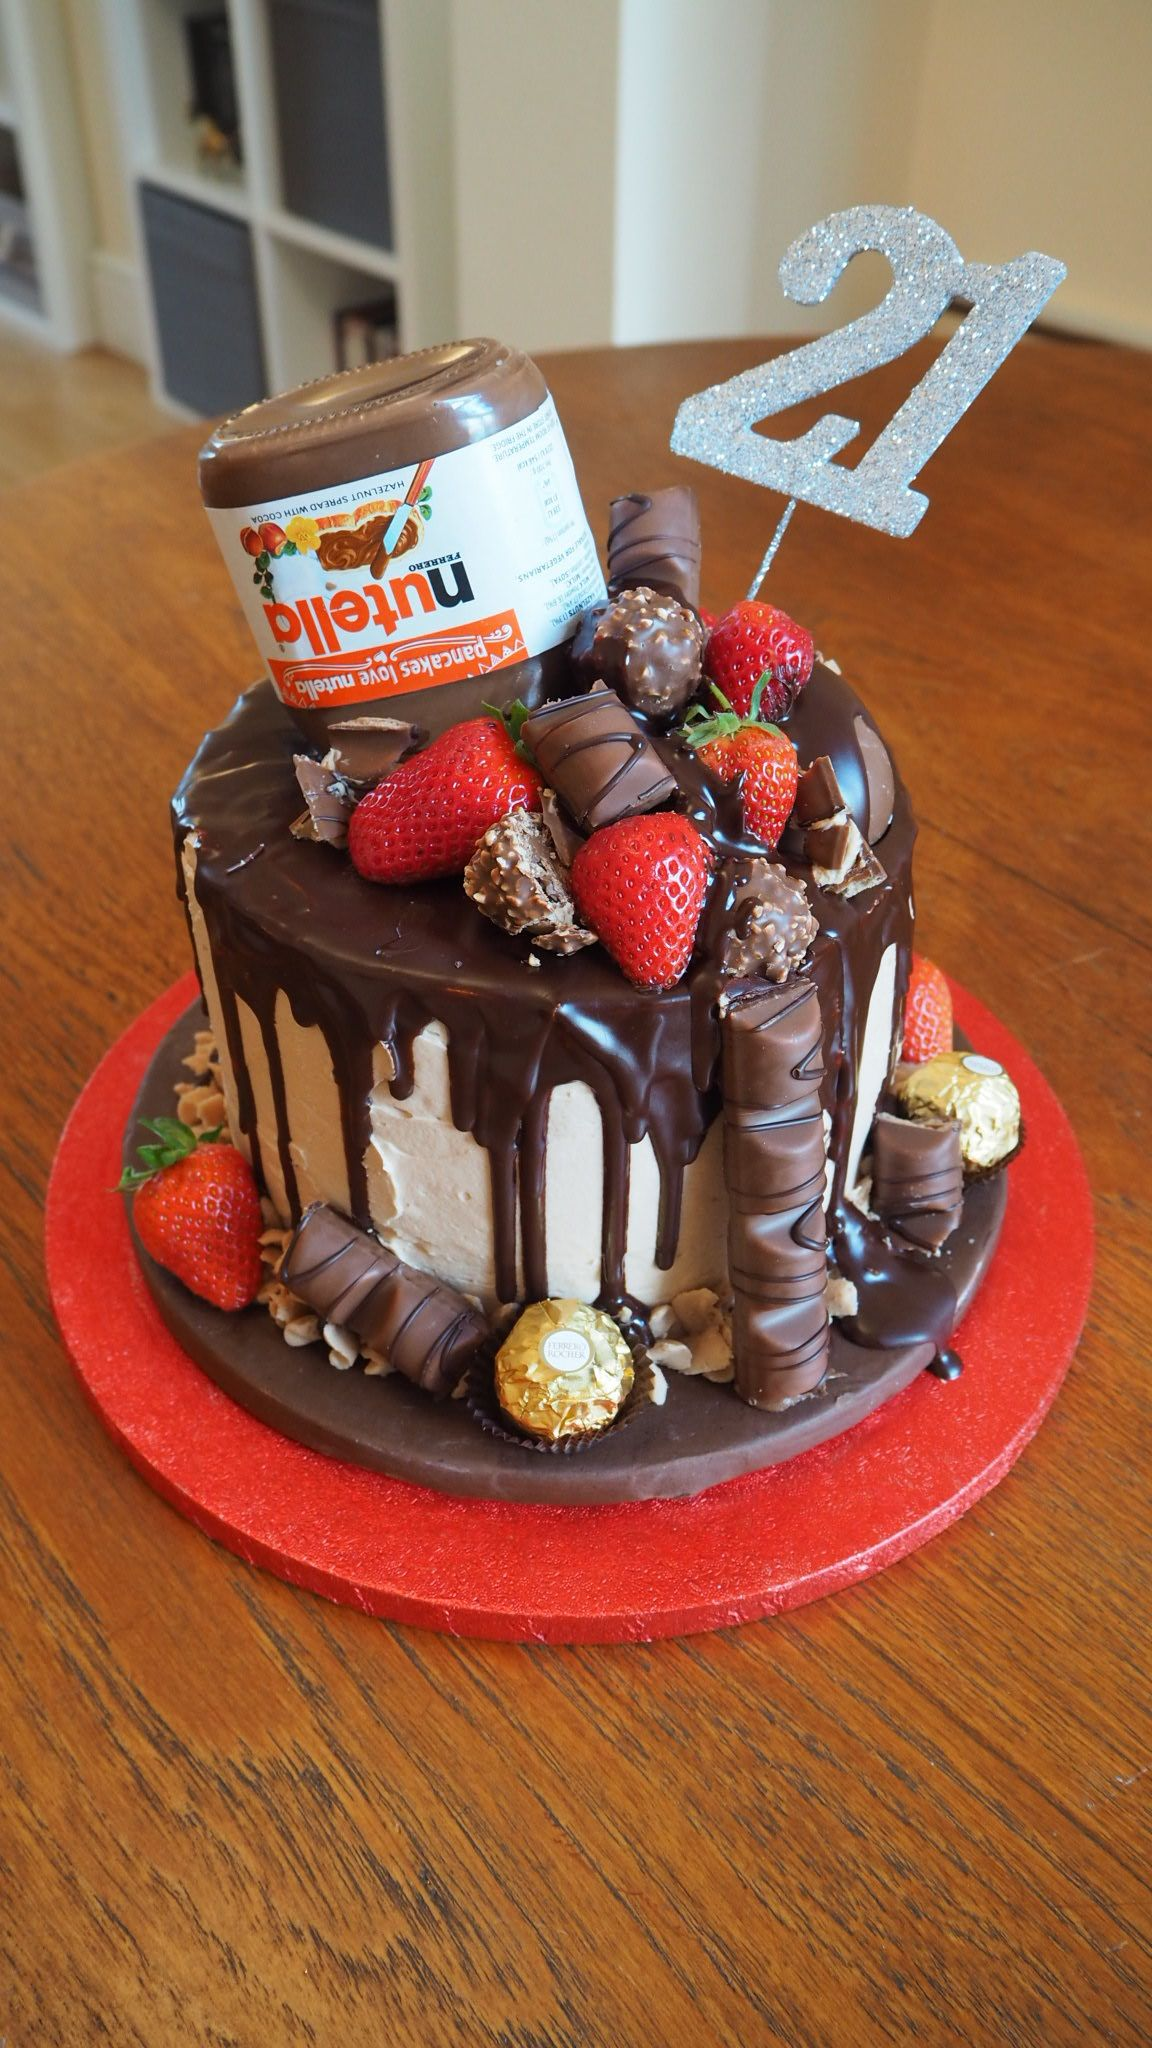 Nutella Chocolate Drip Cake Nutella Birthday Cake Birthday Cake